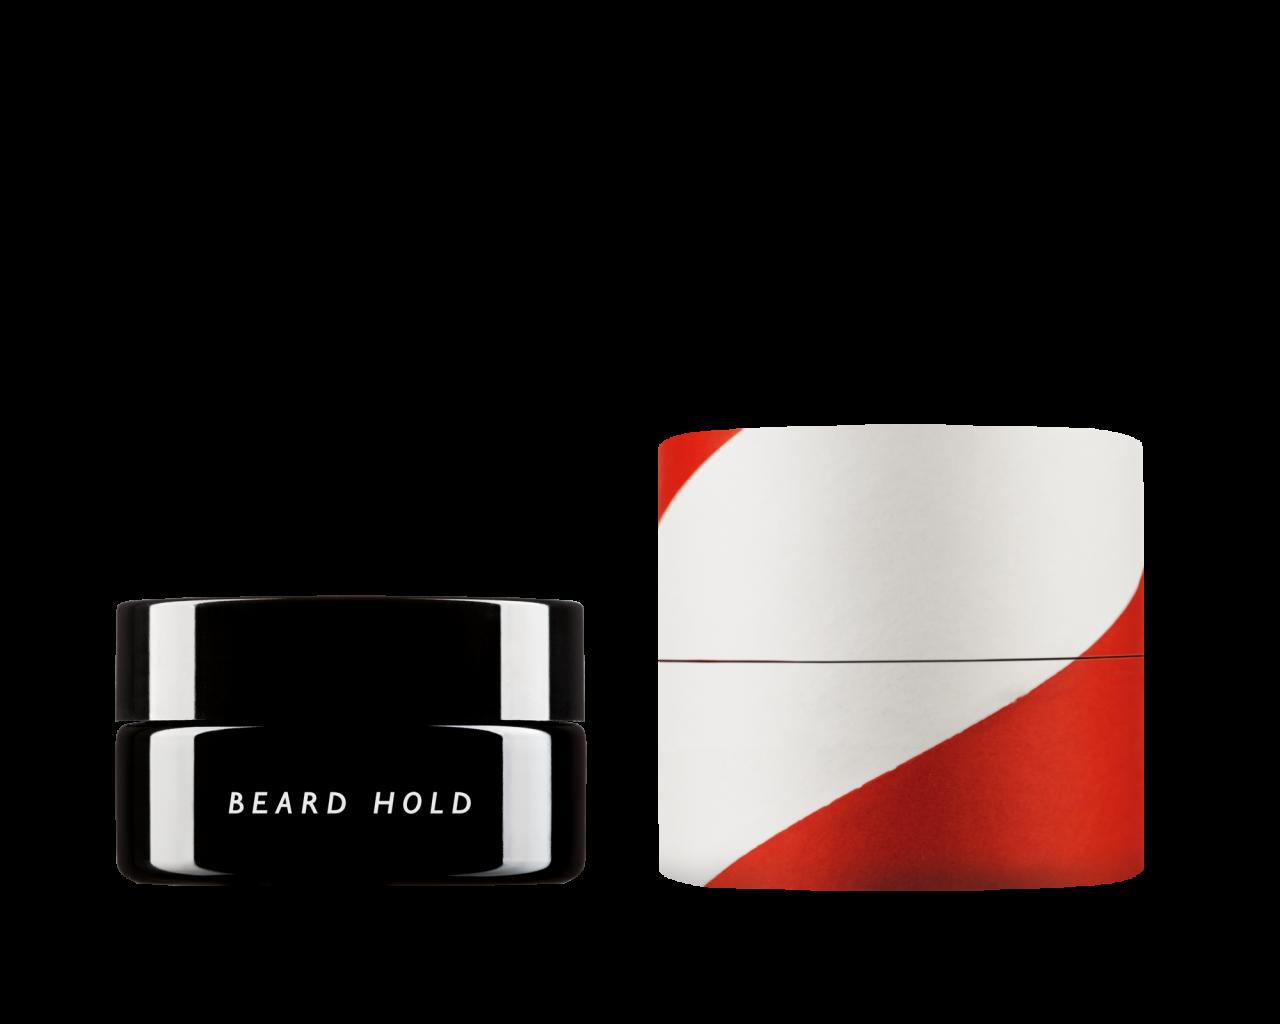 Beard Hold